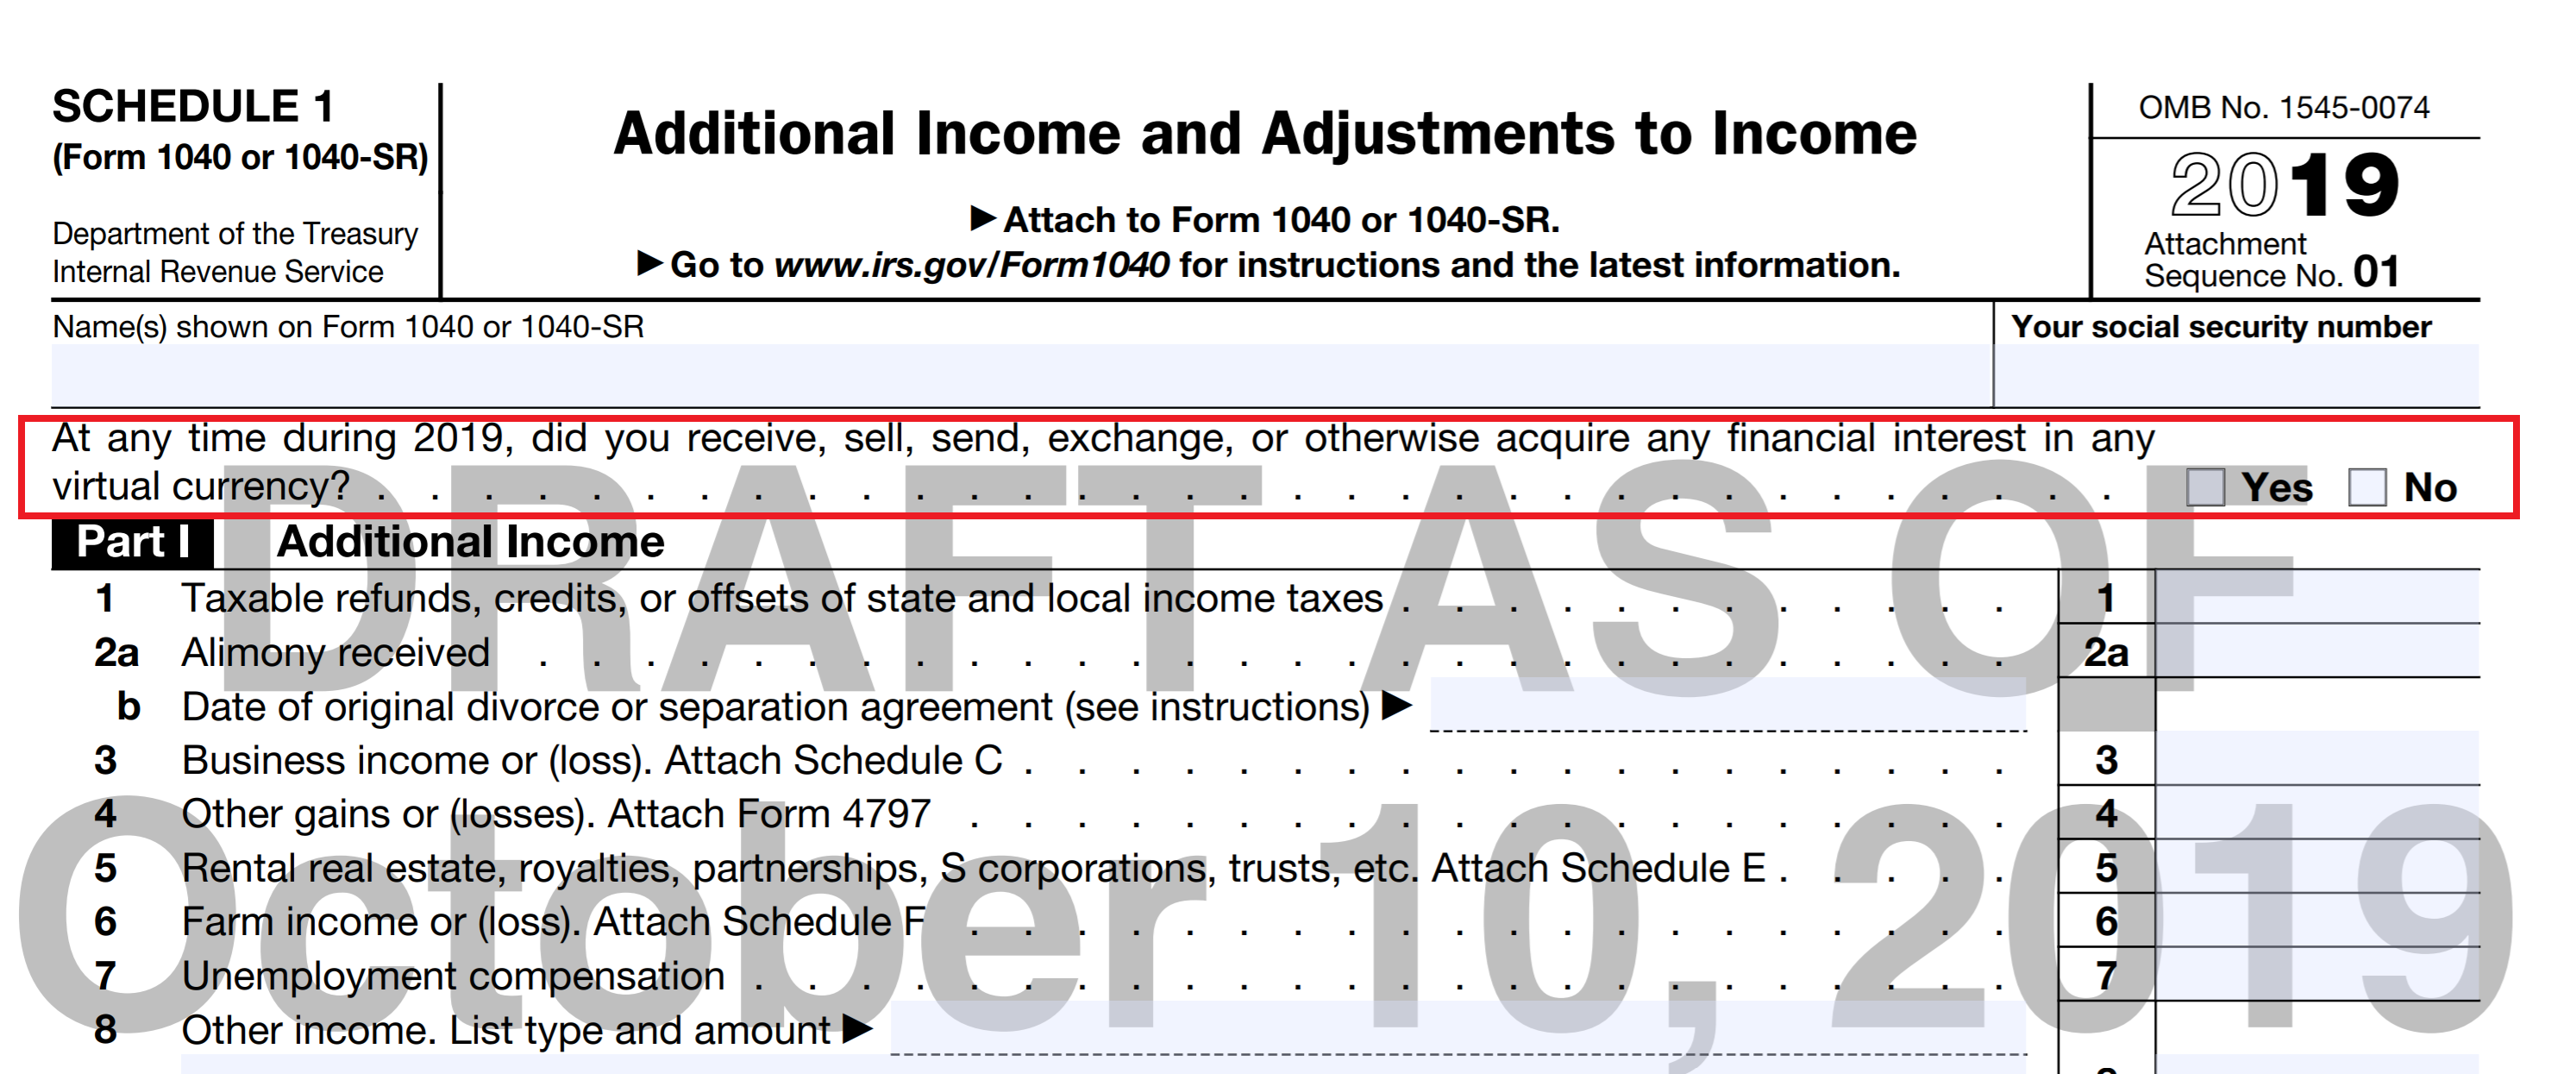 "Las agencias fiscales planean tomar medidas enérgicas contra ""docenas"" de evasores fiscales ""width ="" 2987 ""height ="" 1245 ""srcset ="" https://blackswanfinances.com/wp-content/uploads/2019/11/schedule-1.png 2987w, https://news.bitcoin.com/wp-content/uploads/2019/11/schedule-1 -300x125.png 300w, https://news.bitcoin.com/wp-content/uploads/2019/11/schedule-1-768x320.png 768w, https://news.bitcoin.com/wp-content/uploads /2019/11/schedule-1-1024x427.png 1024w, https://news.bitcoin.com/wp-content/uploads/2019/11/schedule-1-696x290.png 696w, https: //news.bitcoin .com / wp-content / uploads / 2019/11 / schedule-1-1392x580.png 1392w, https://news.bitcoin.com/wp-content/uploads/2019/11/schedule-1-1068x445.png 1068w , https://news.bitcoin.com/wp-content/uploads/2019/11/schedule-1-1008x420.png 1008w ""tamaños ="" (ancho máximo: 2987px) 100vw, 2987px"